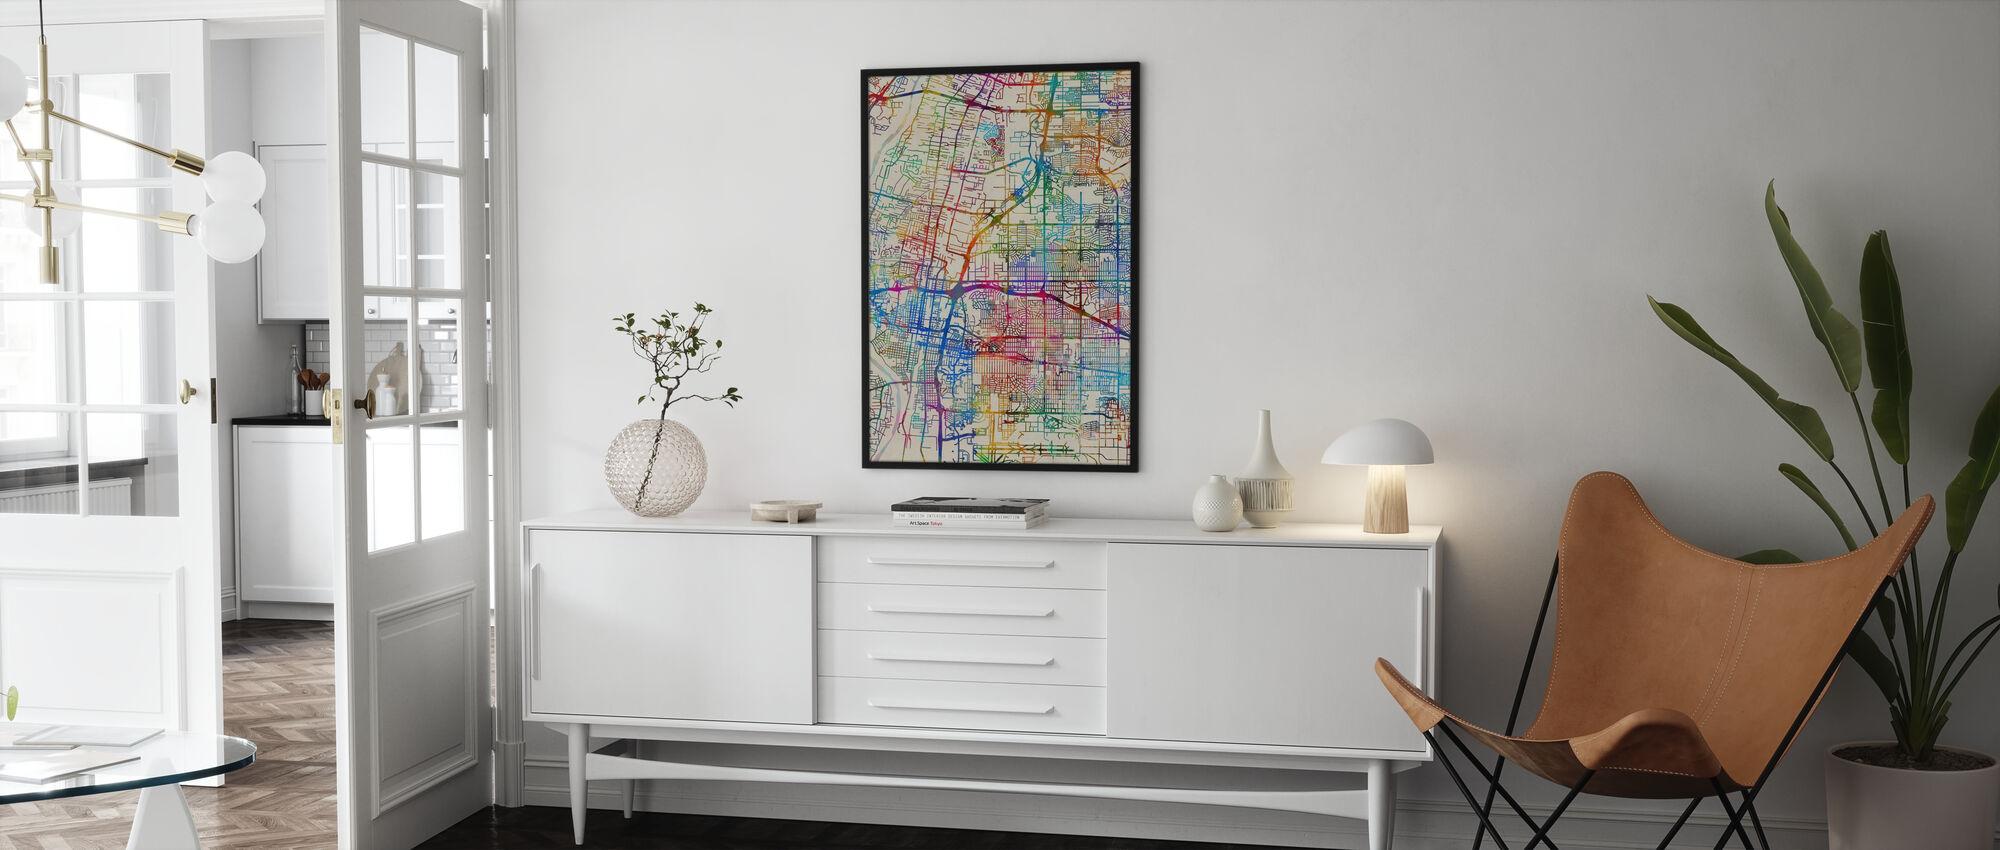 Albuquerque New Mexico City Street Map - Poster - Living Room